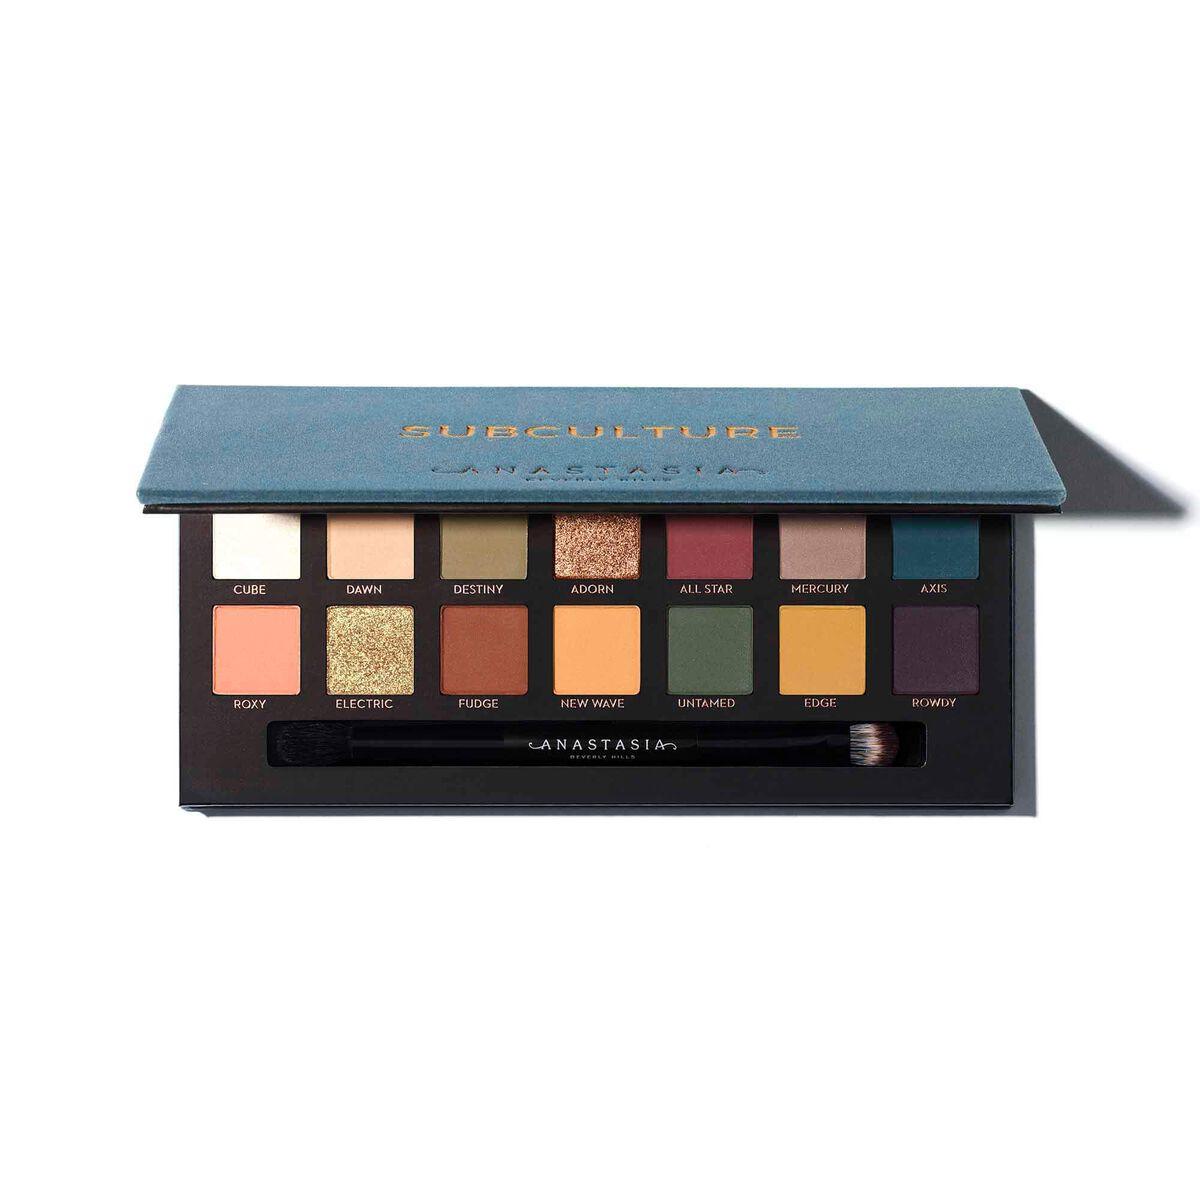 Subculture Eyeshadow Palette   Eye Palettes - Anastasia Beverly Hills